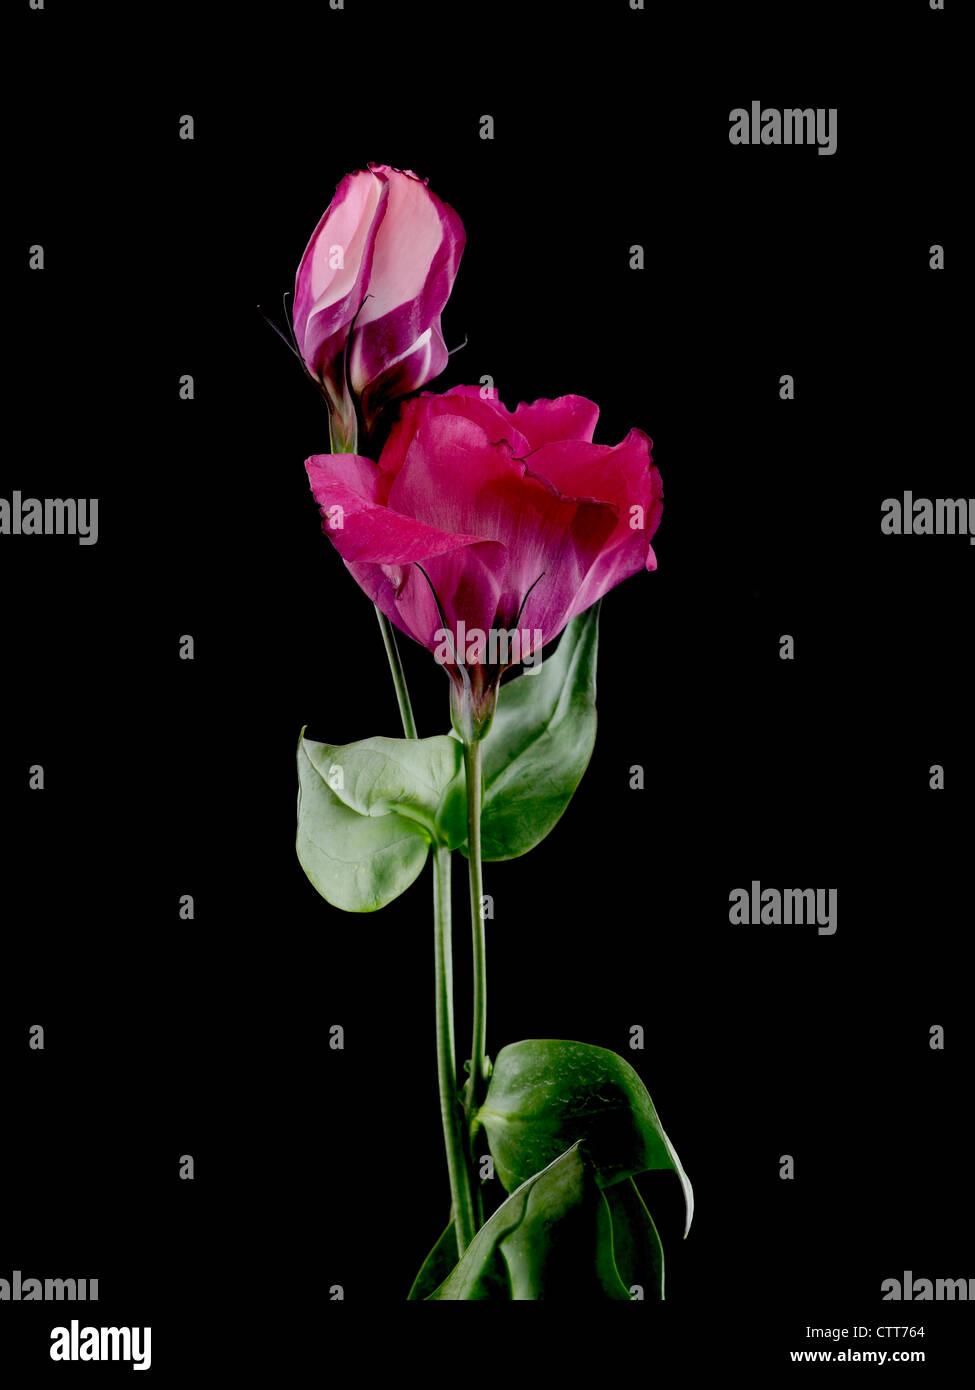 Eustoma cultivar, Lisianthus, Pink, Black. - Stock Image